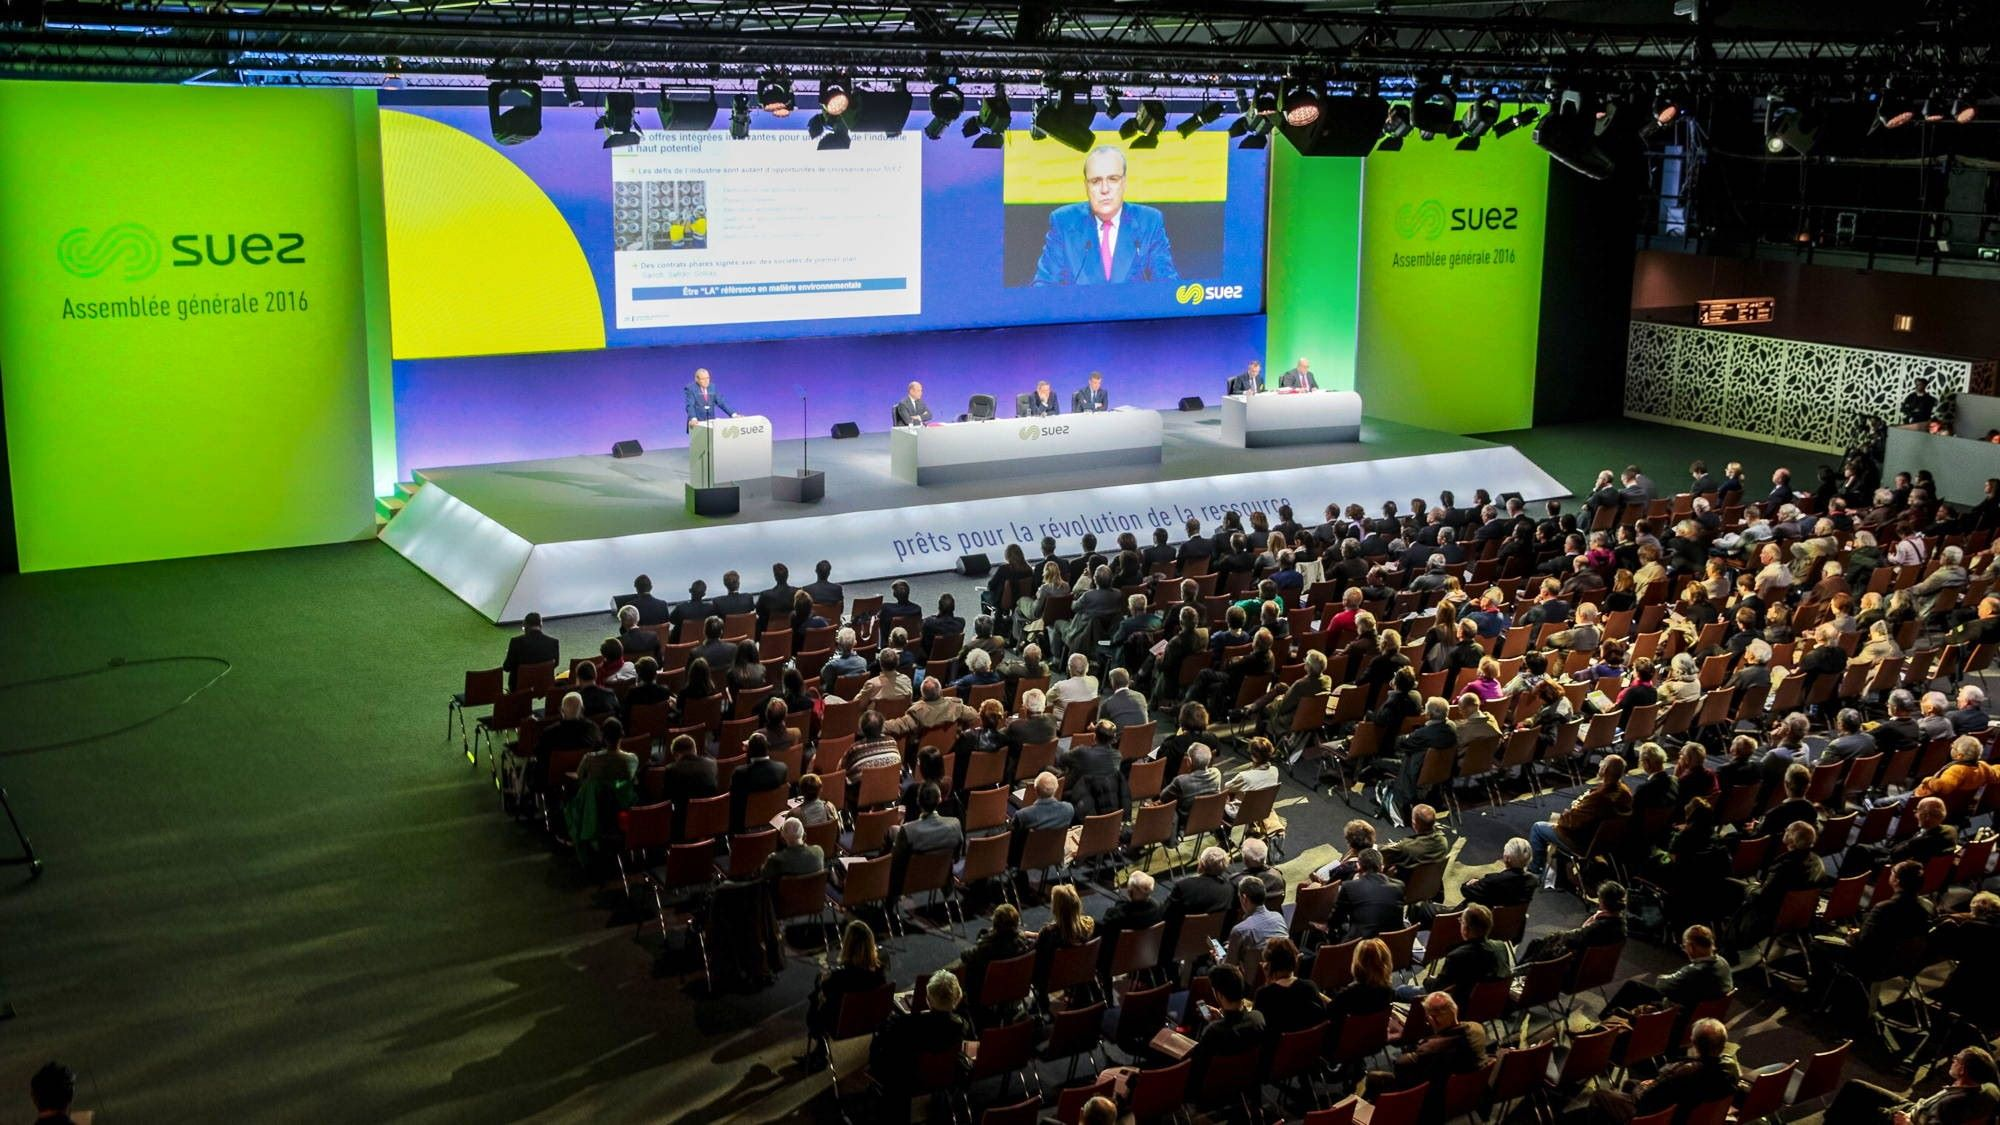 Suez General Meeting 2016